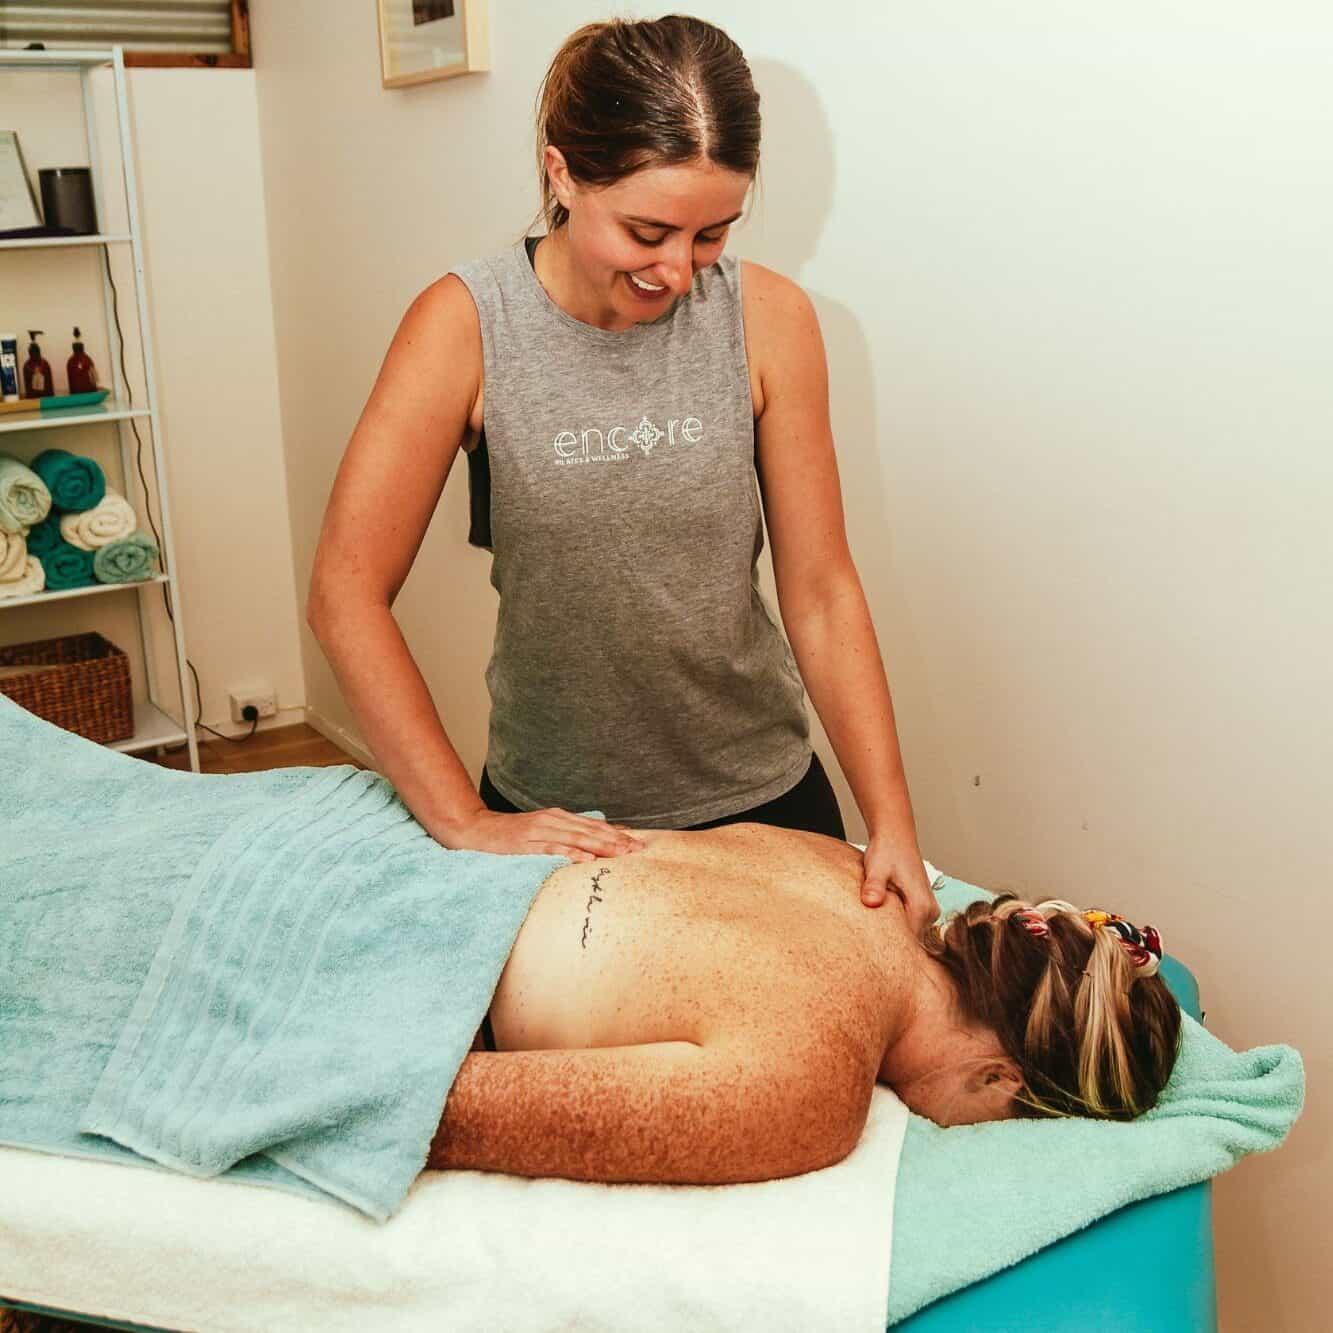 remedial massage therapy darwin square